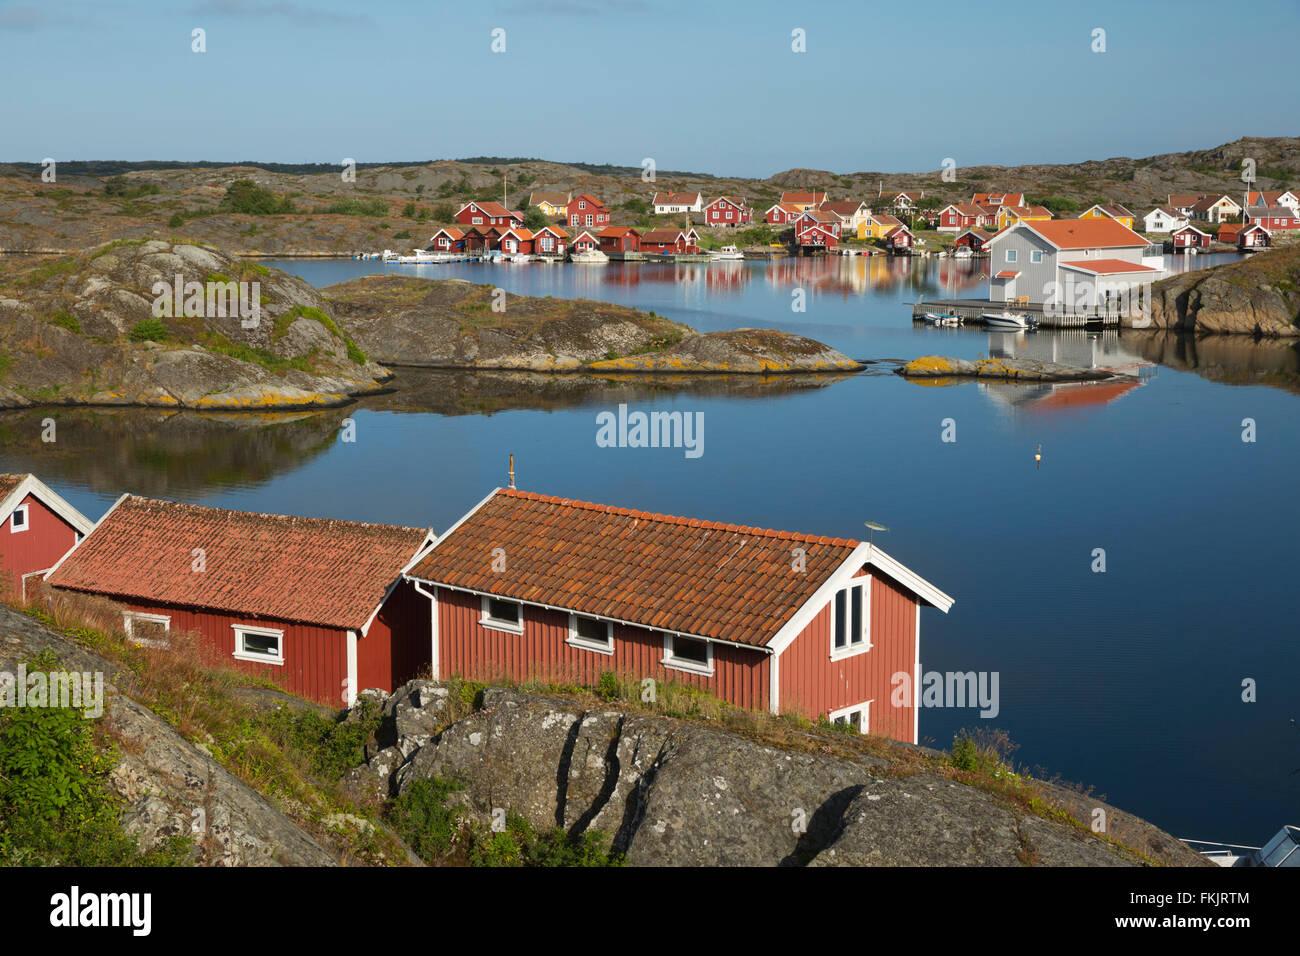 View to falu red fishermen's houses, Stocken, Orust, Bohuslän Coast, Southwest Sweden, Sweden, Scandinavia, - Stock Image